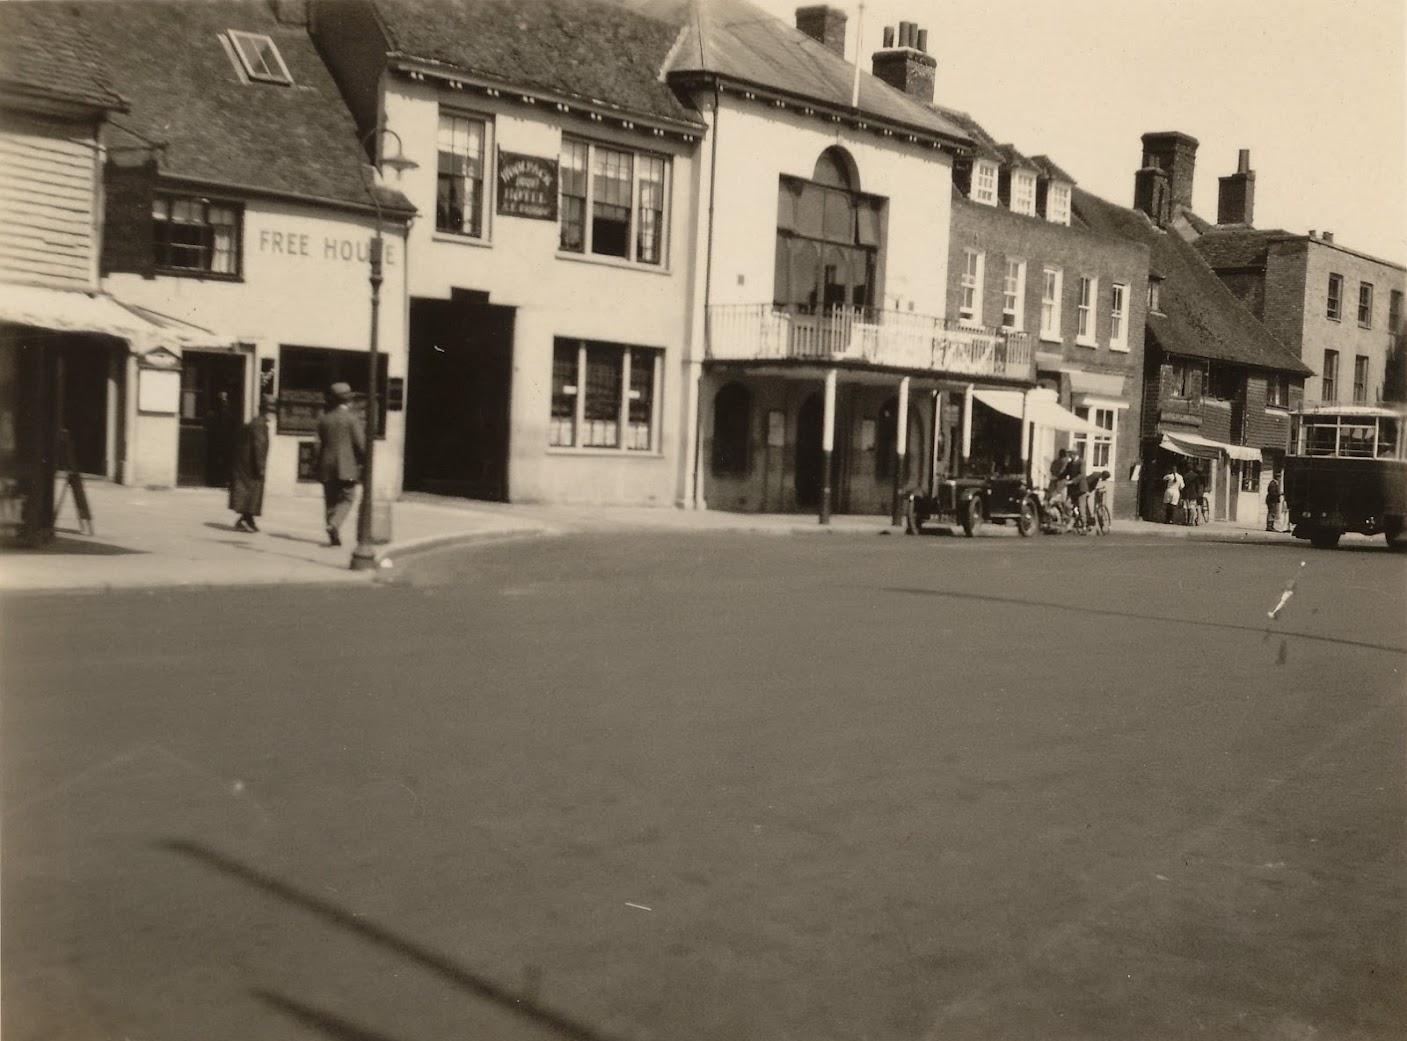 Tenterden Archive 1930 - Tenterden Town Hall